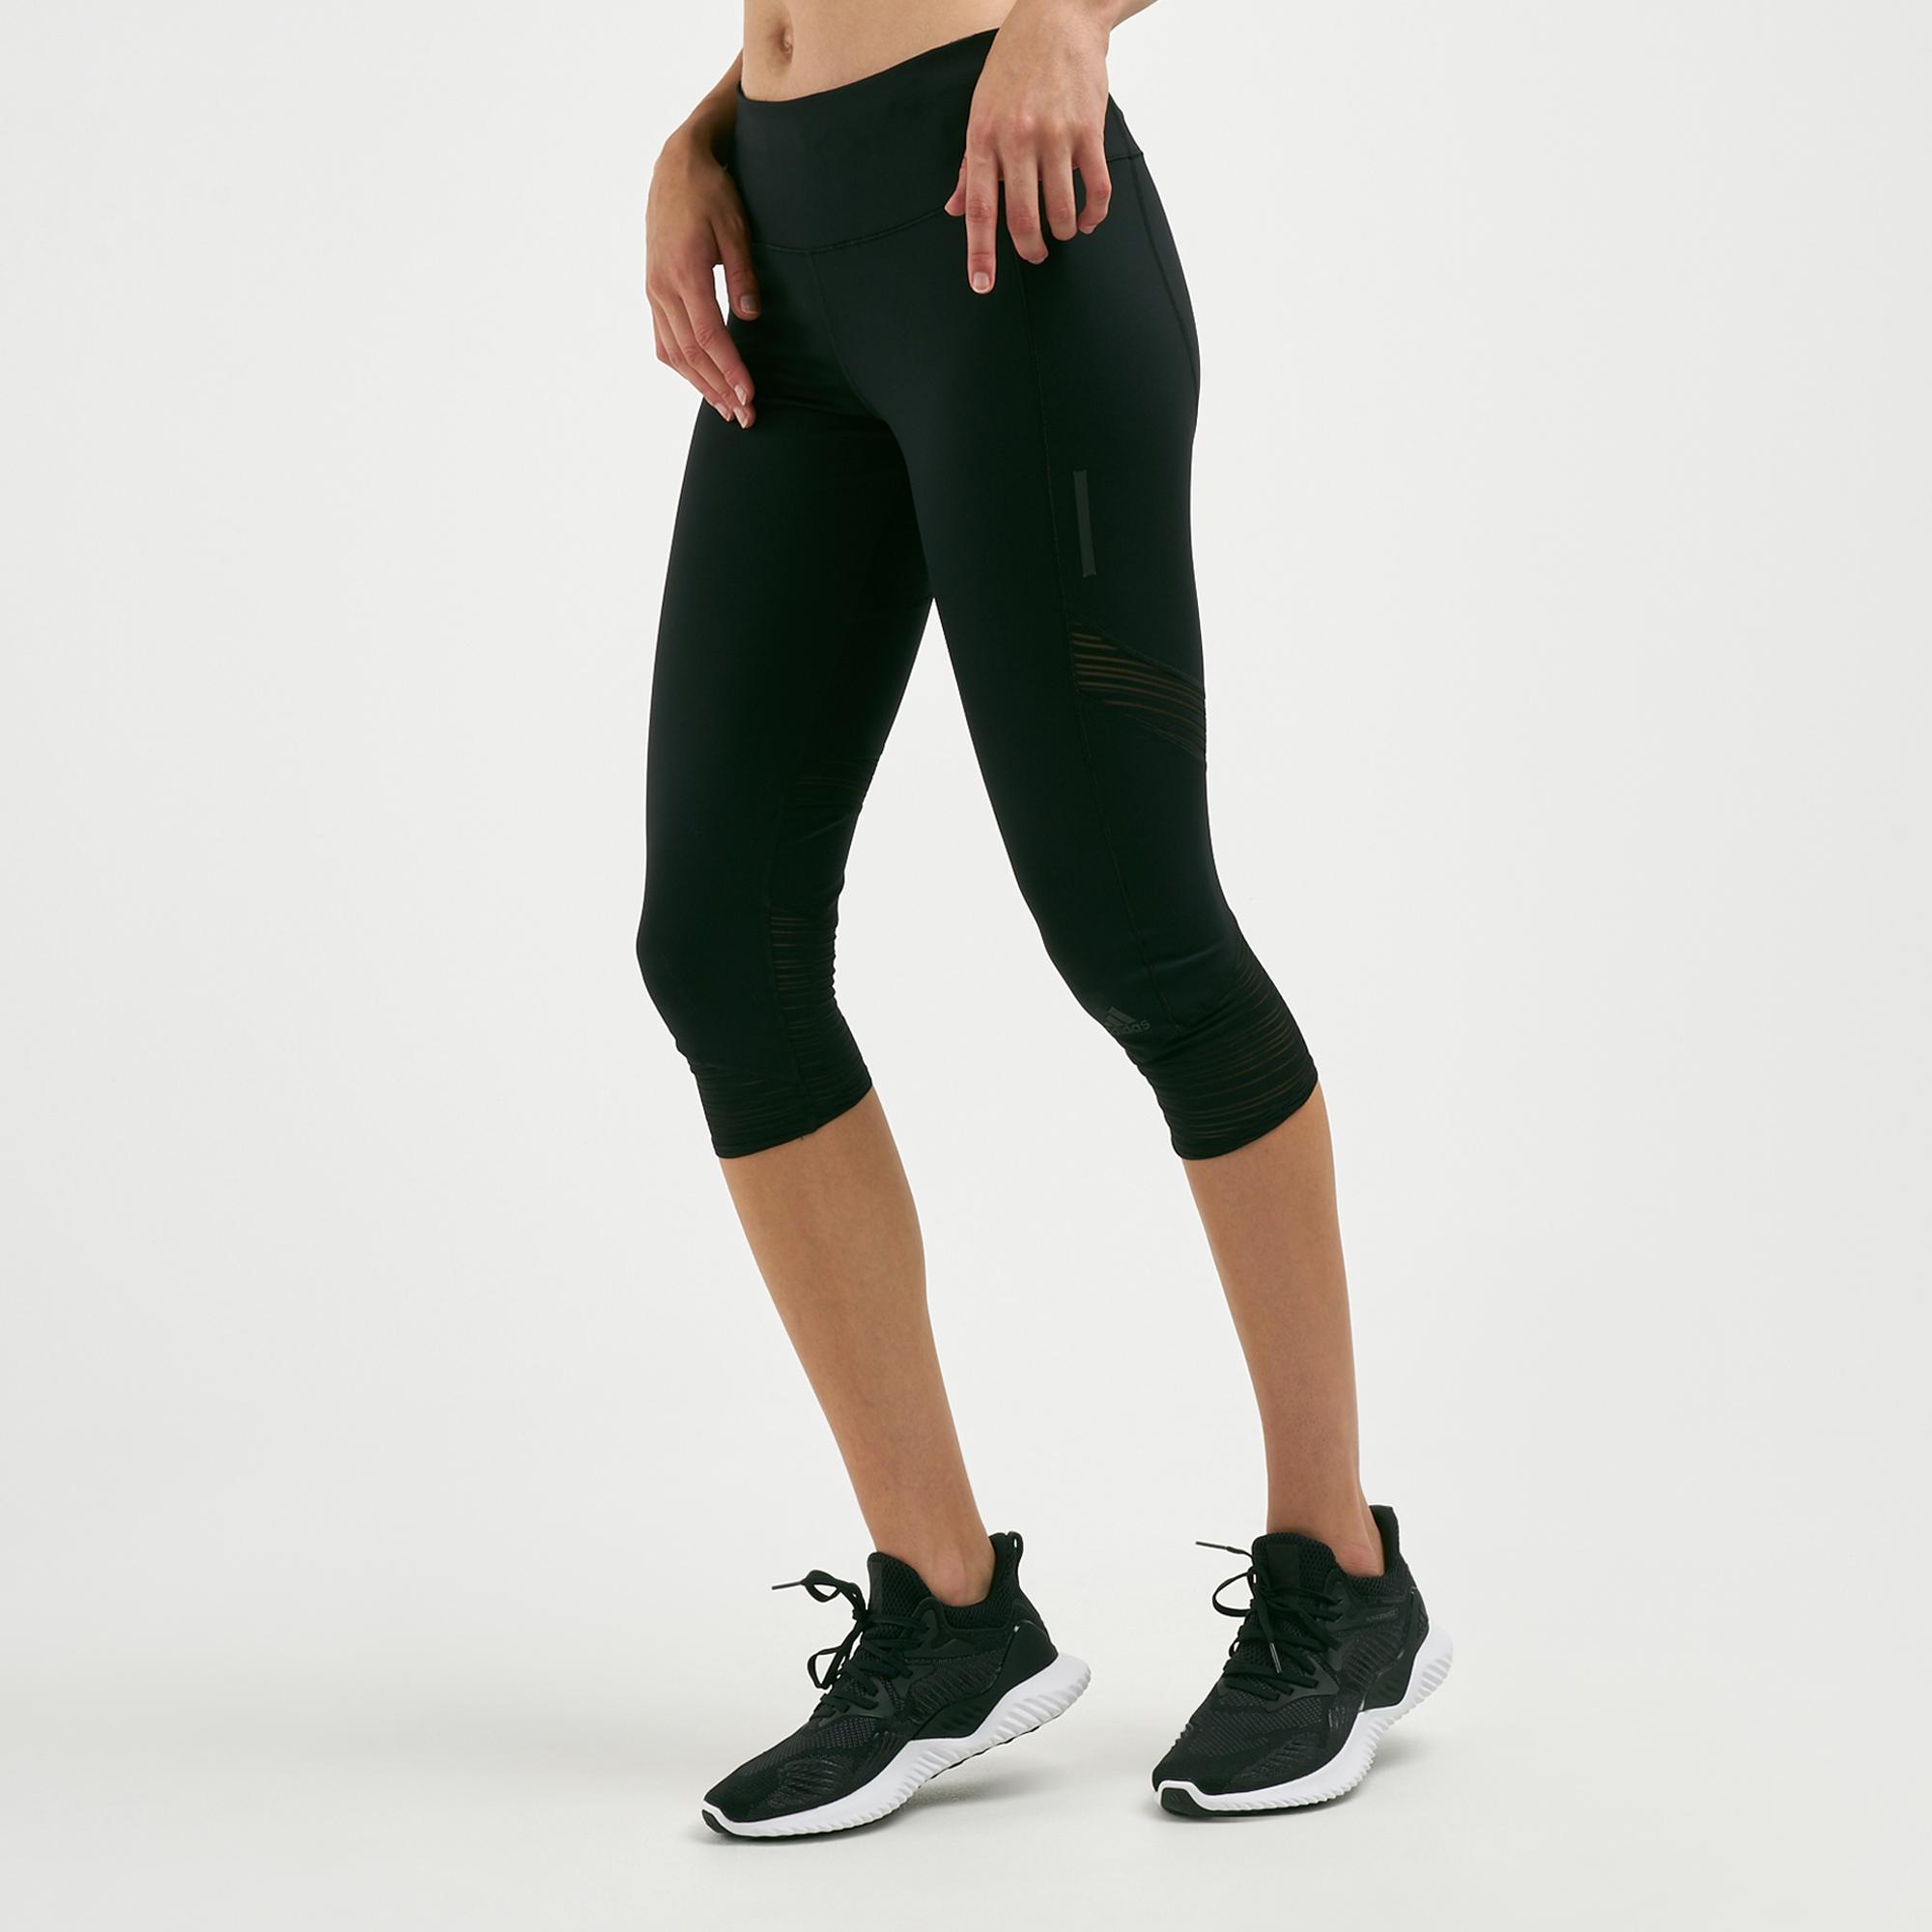 80ca4b083b74f adidas Women's How We Do Three-Quarter Leggings | Capri Leggings ...